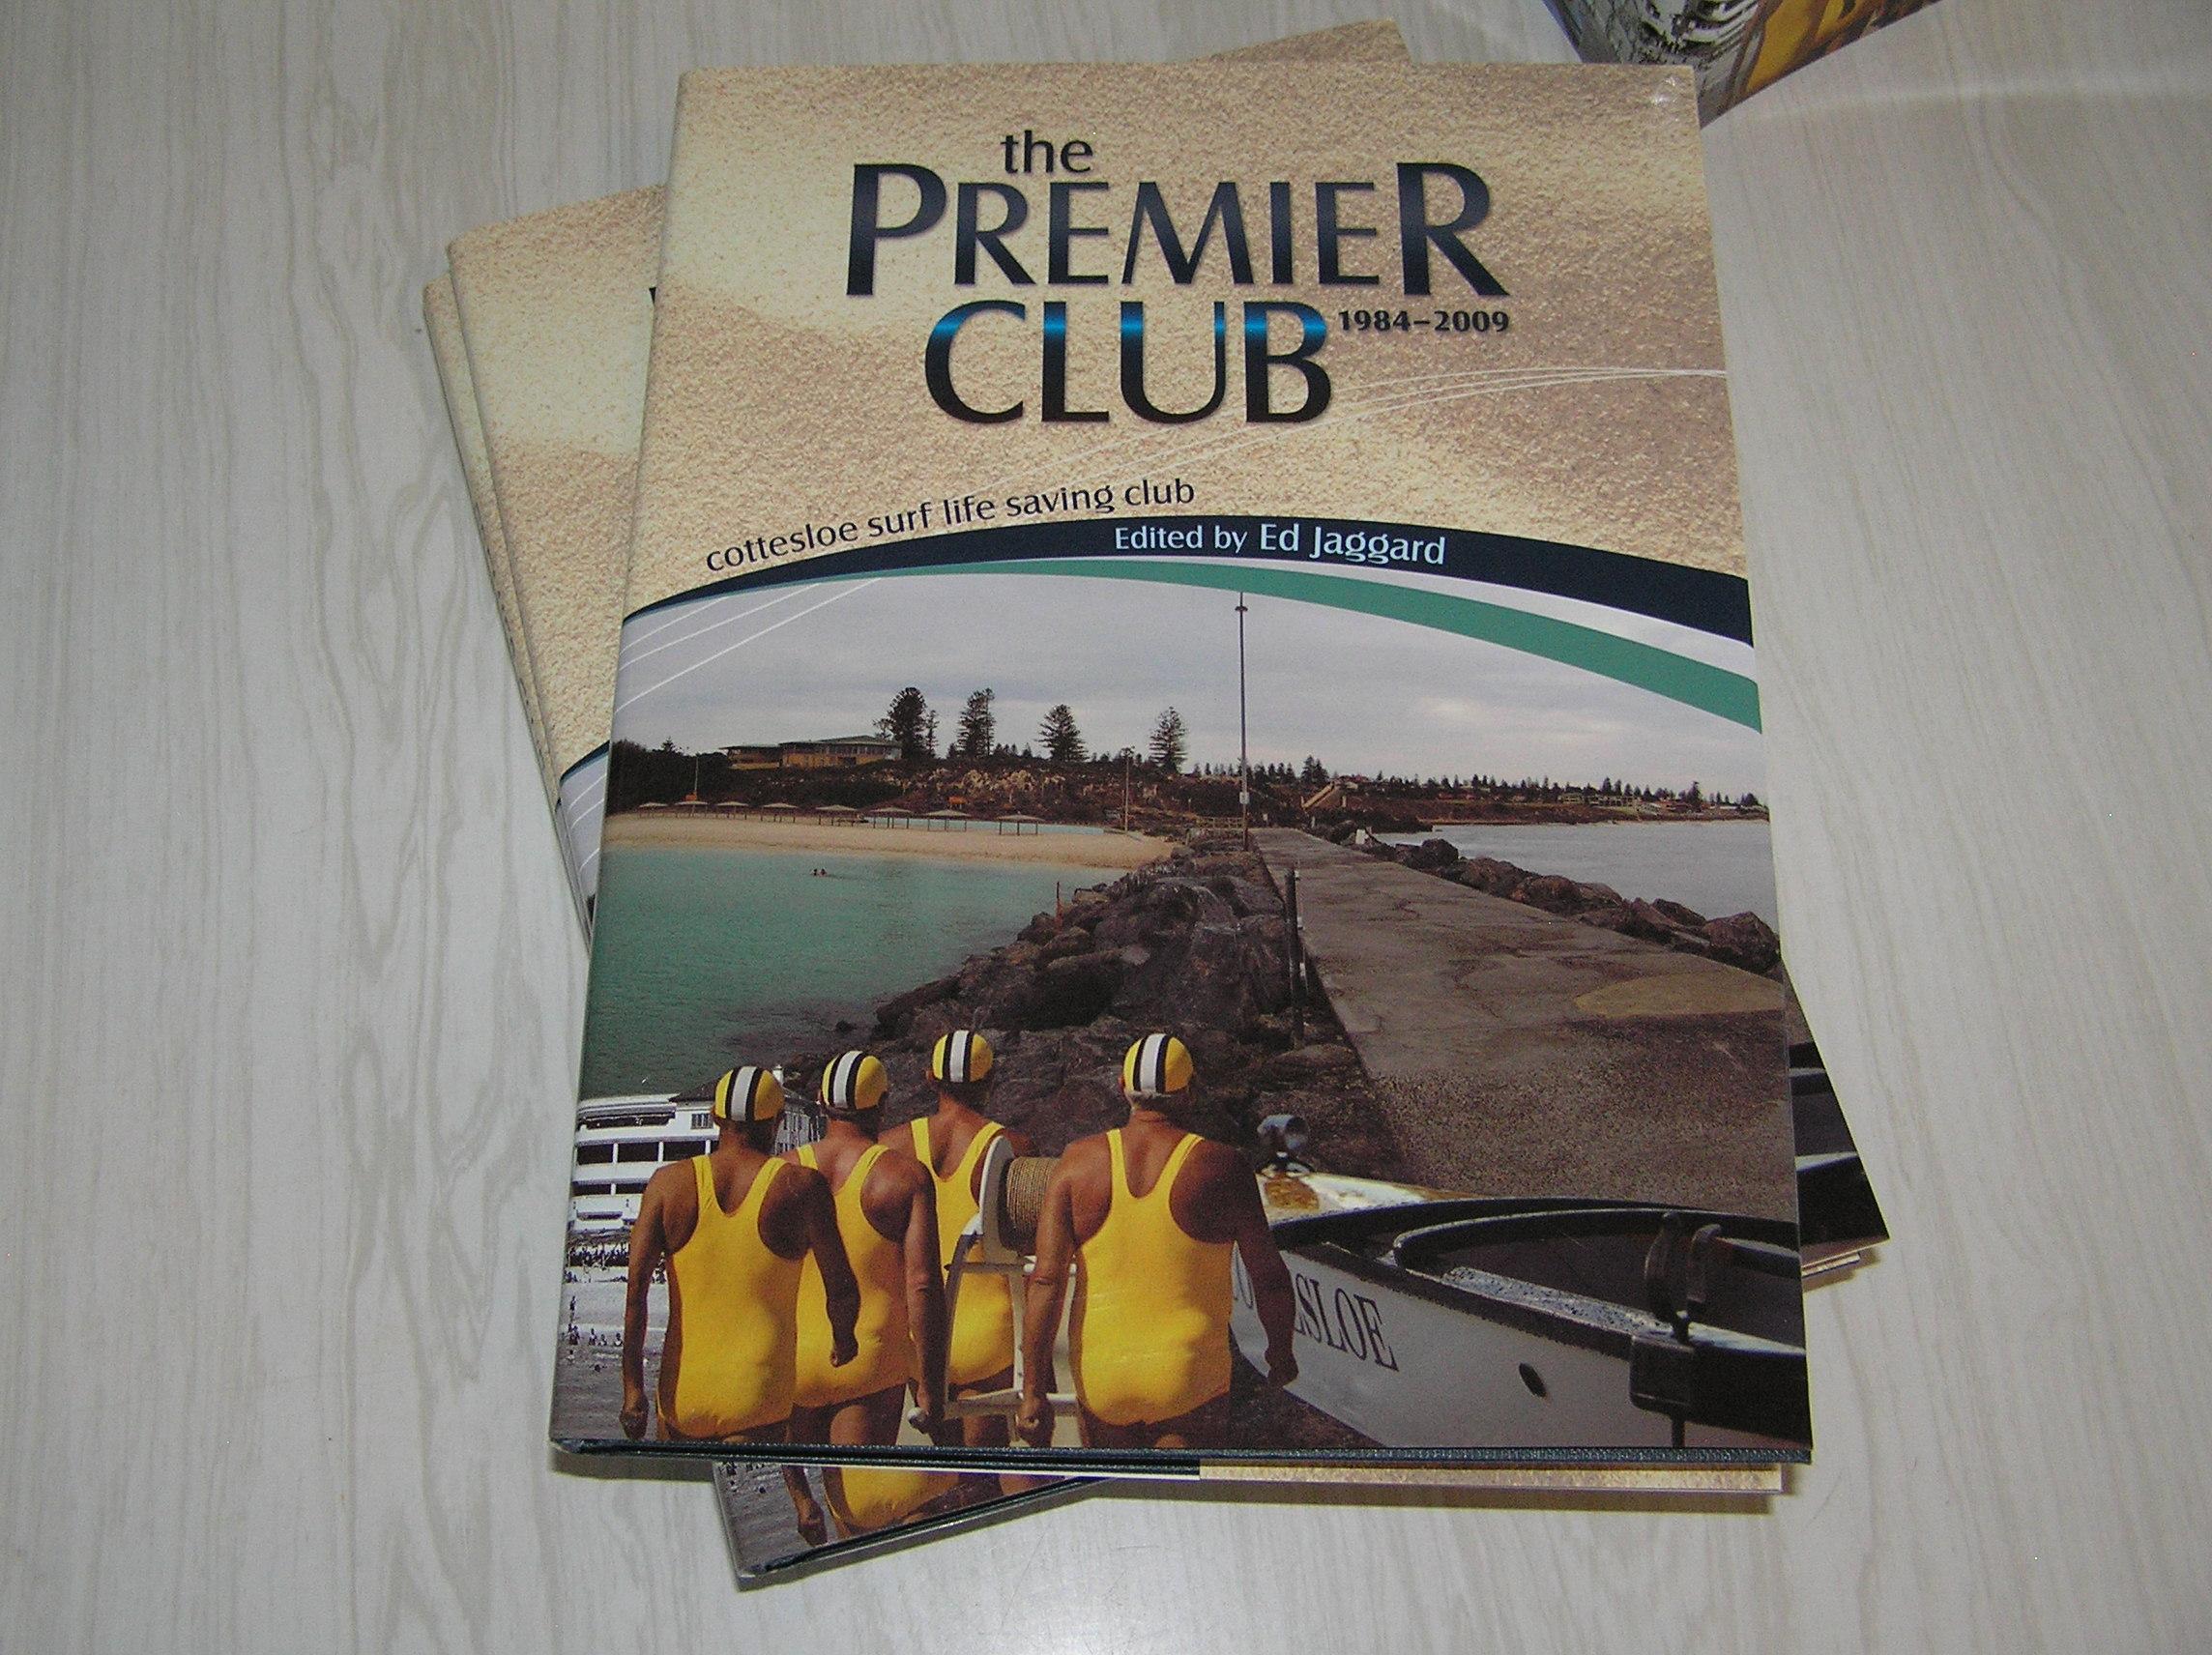 The Premier Club